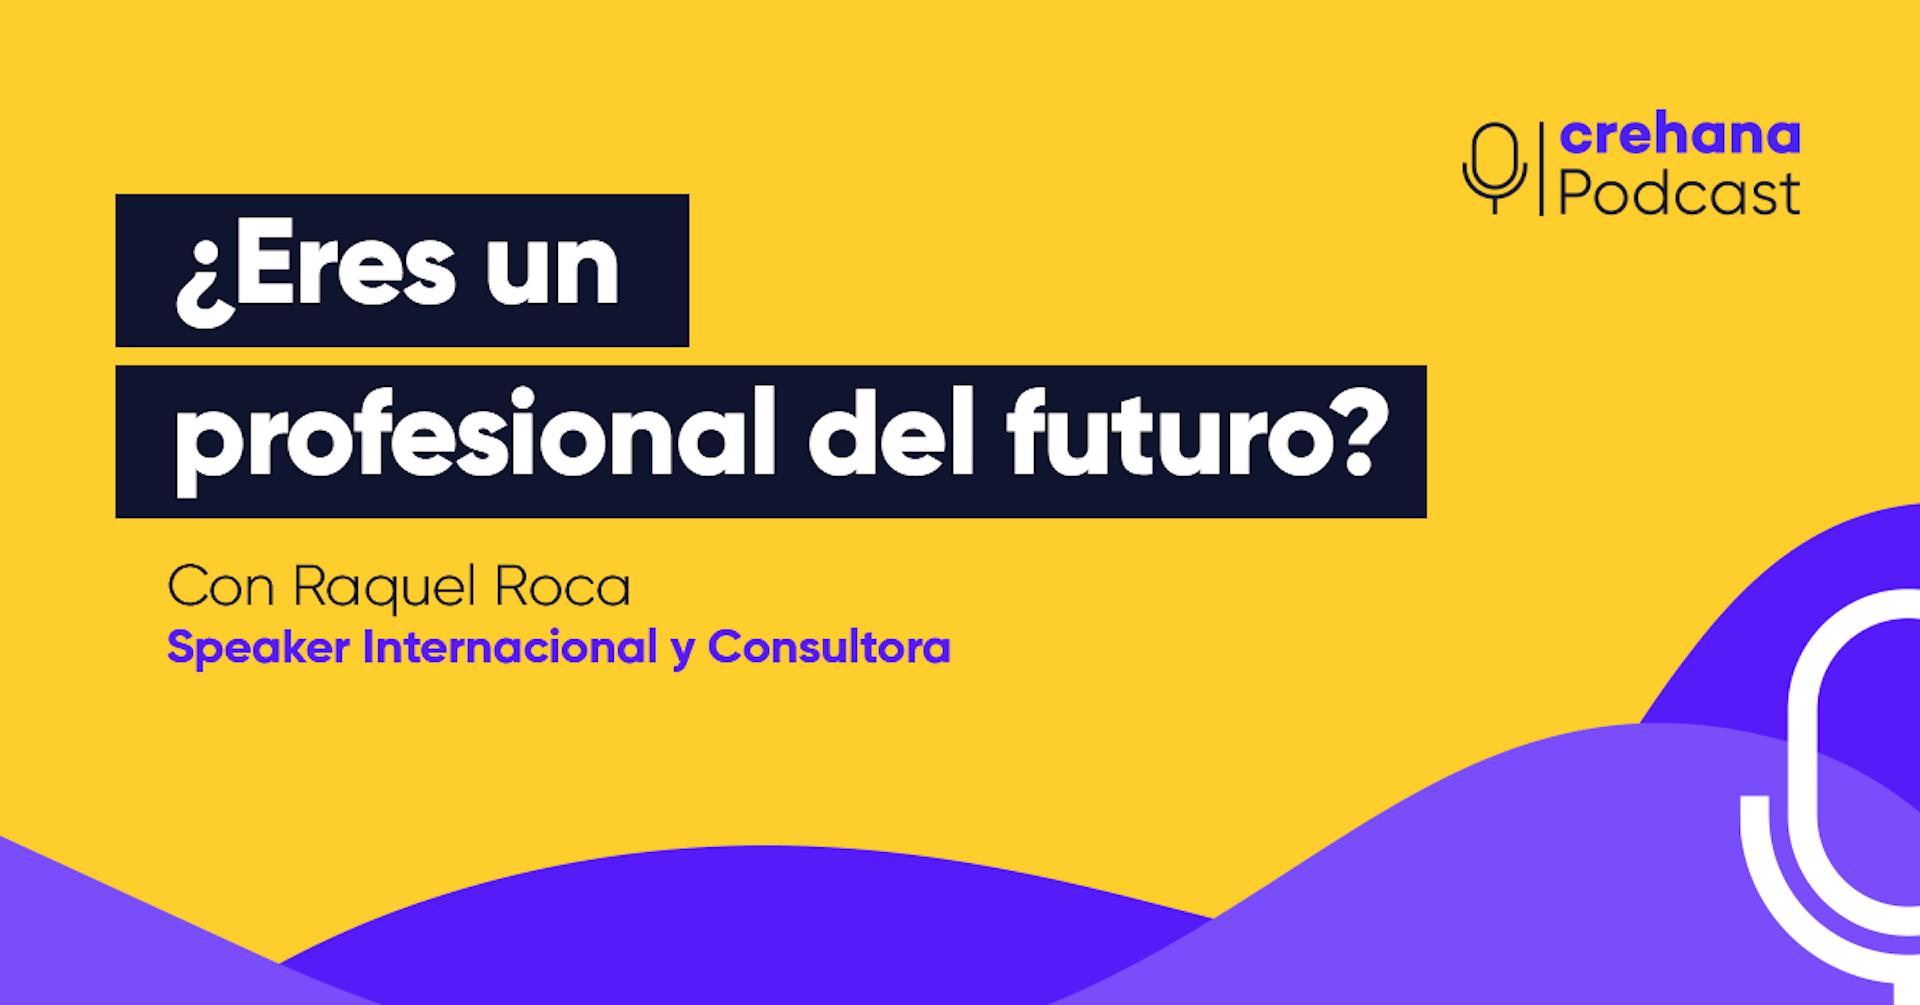 Crehana Podcast: ¿Eres un profesional del futuro?